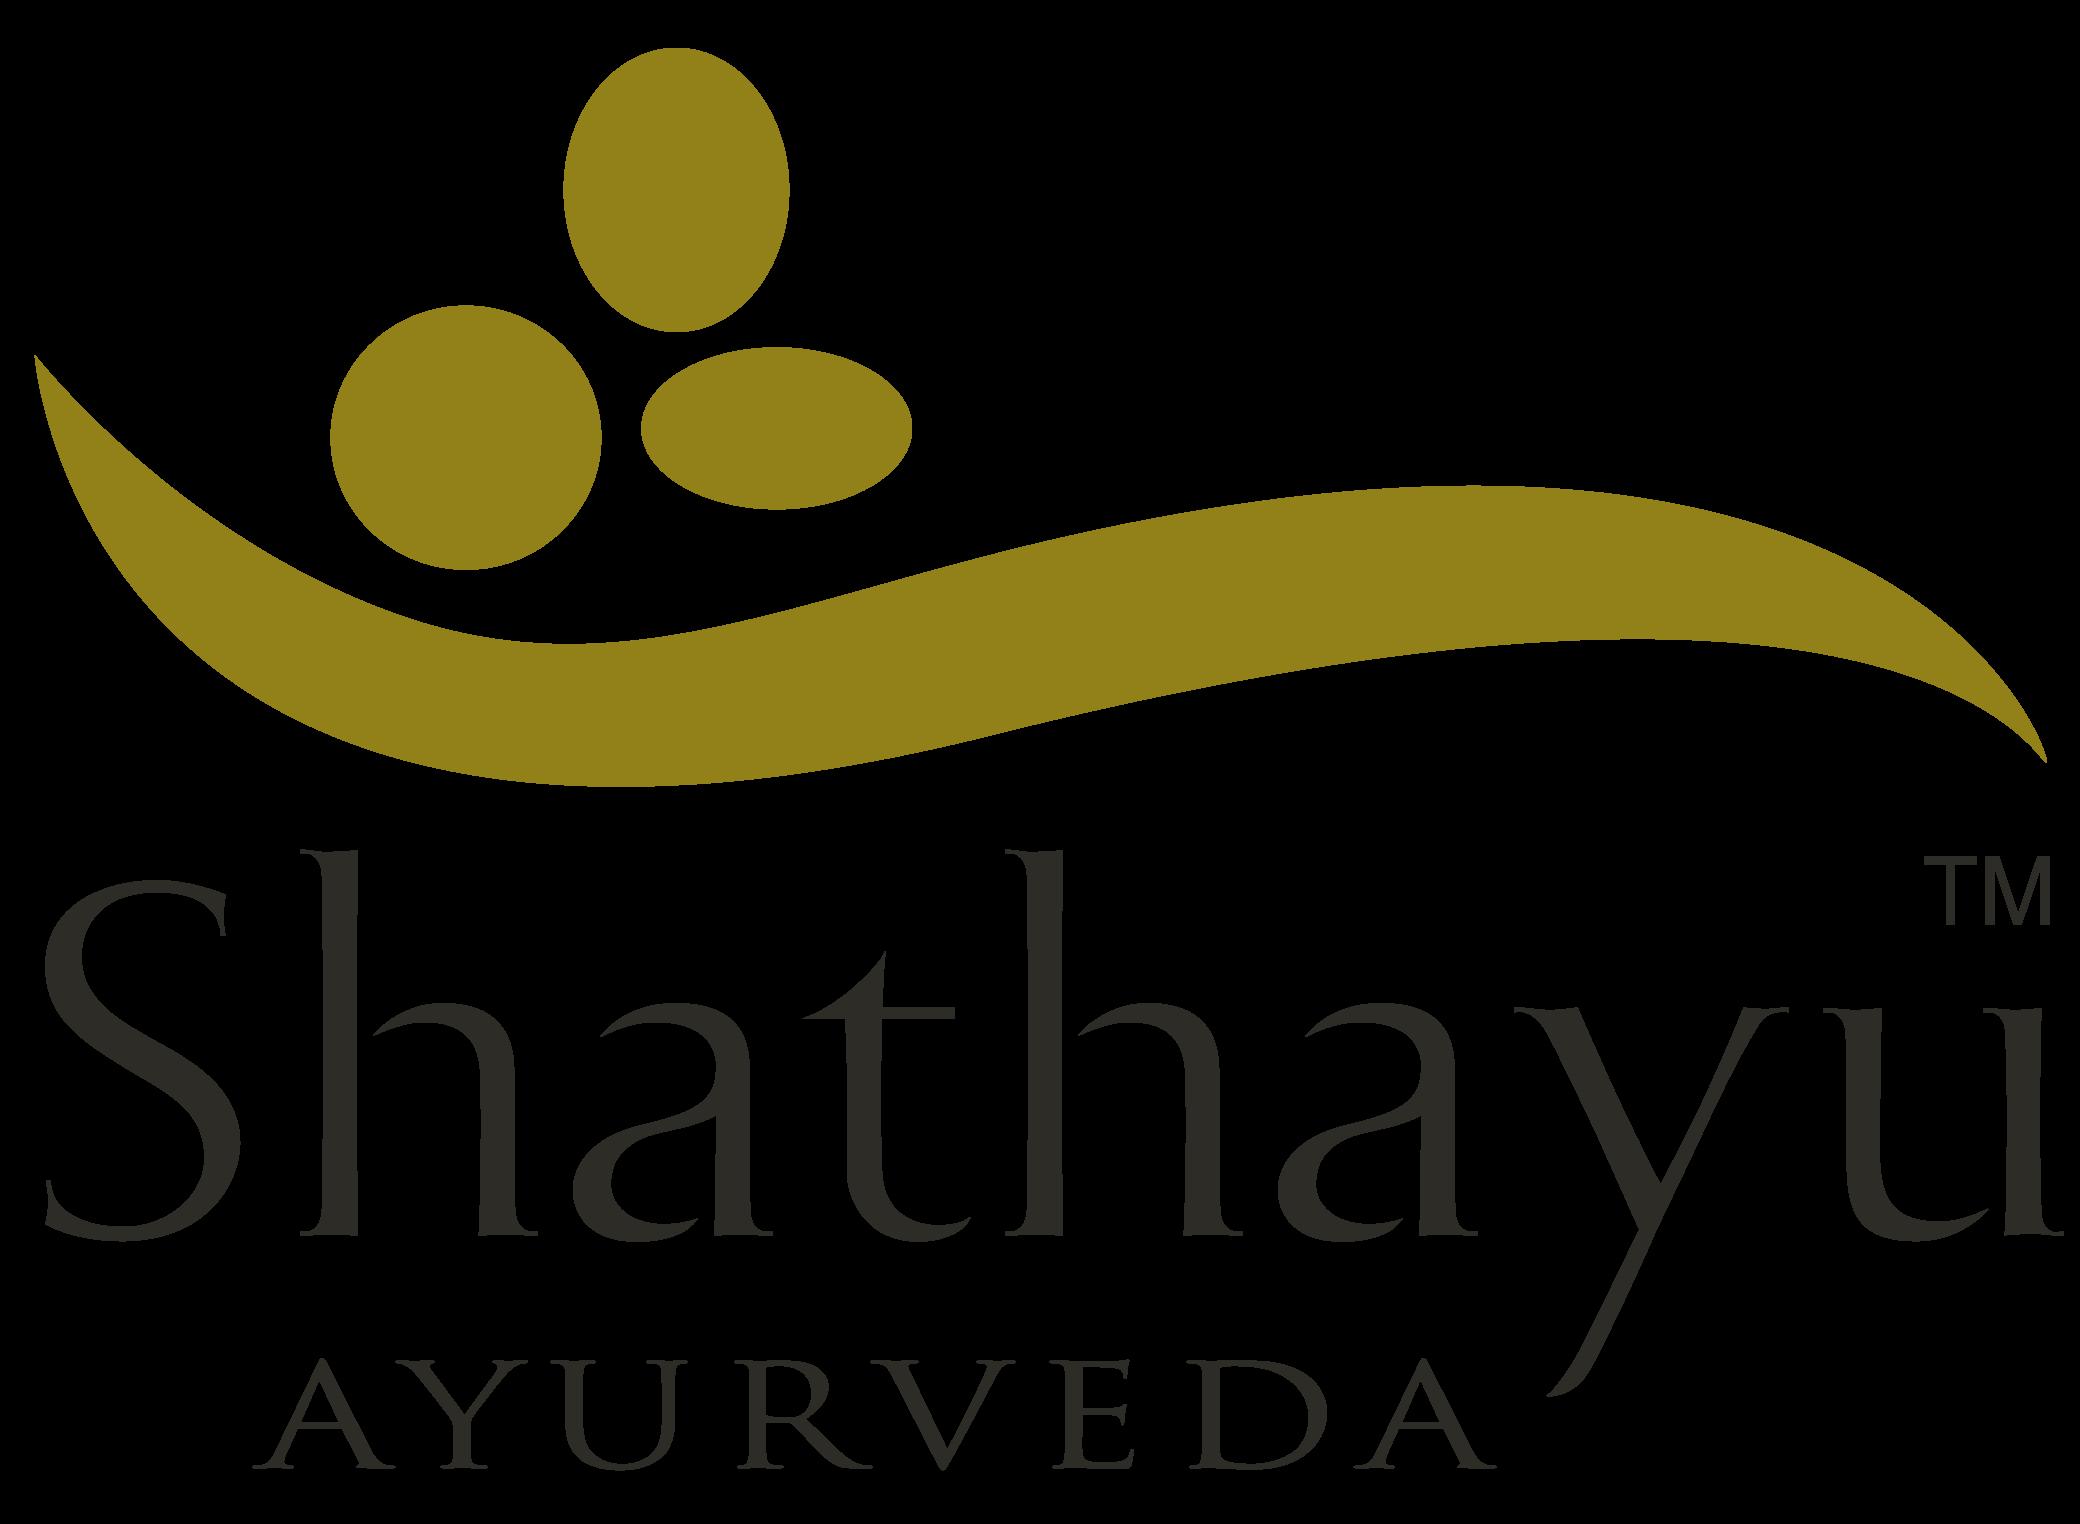 Shathayu Ayurveda Wellness Center - Kasturi Nagar - Bangalore Image